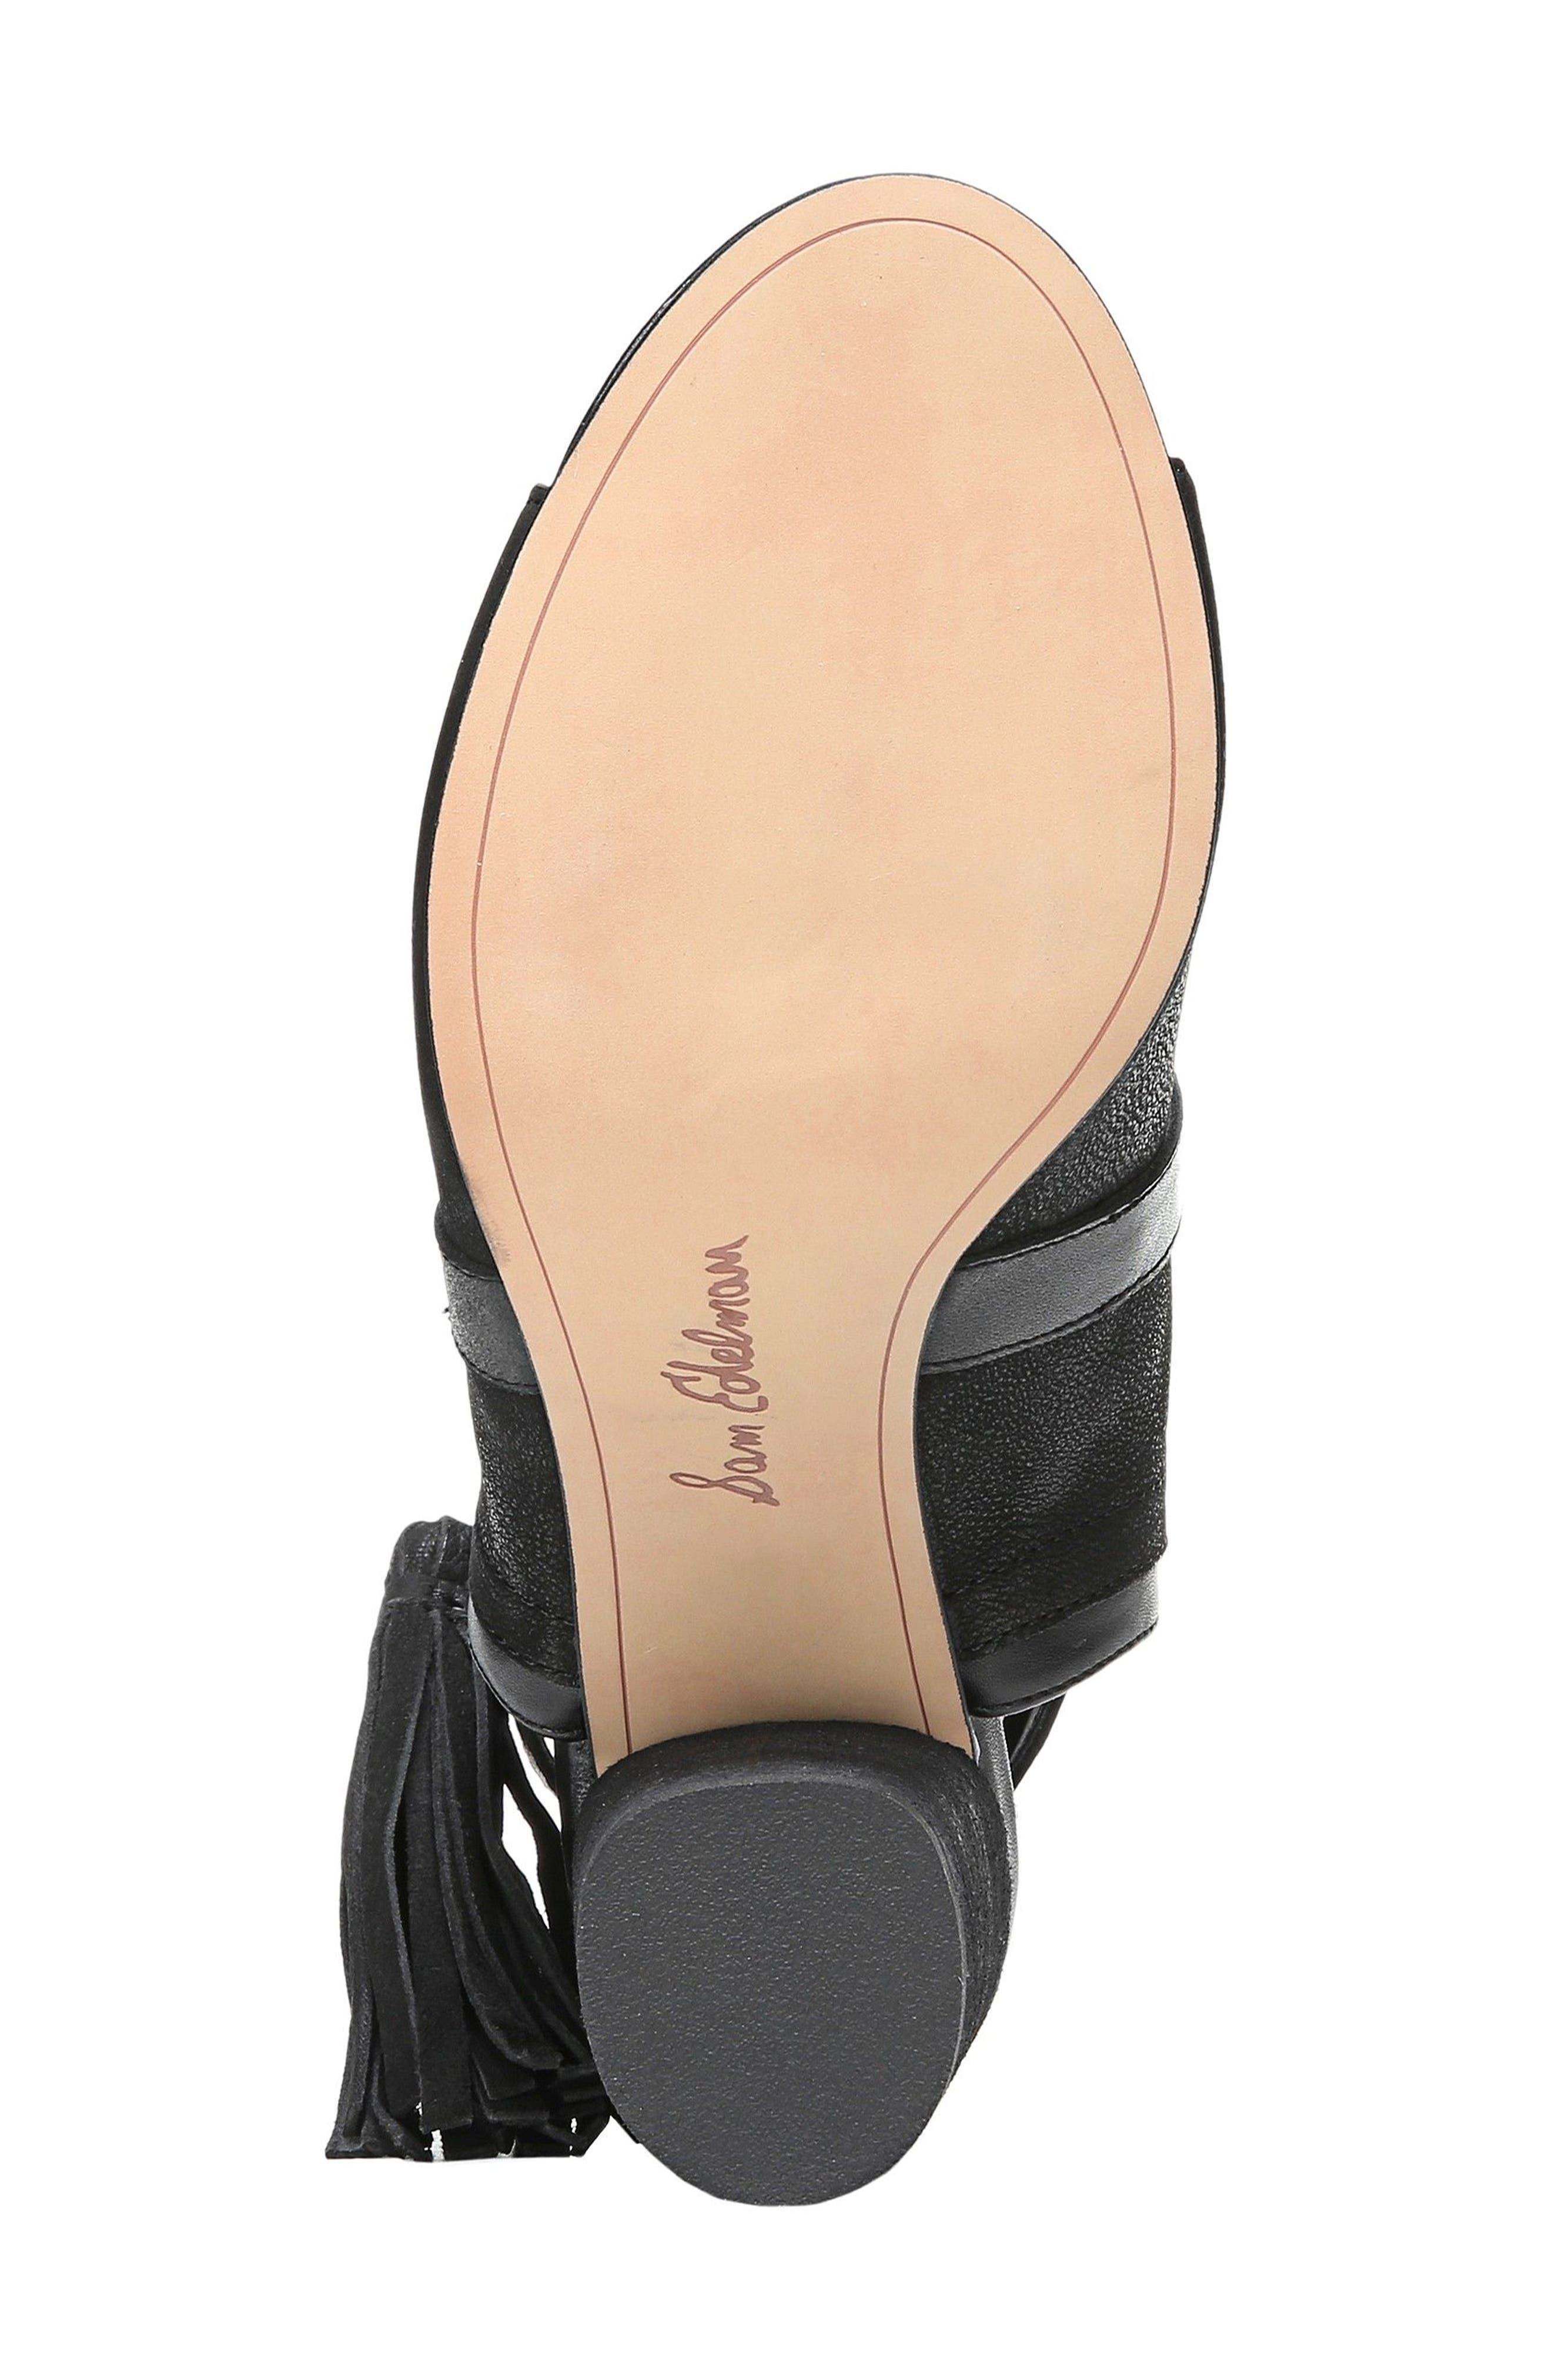 Vermont Block Heel Sandal,                             Alternate thumbnail 6, color,                             001